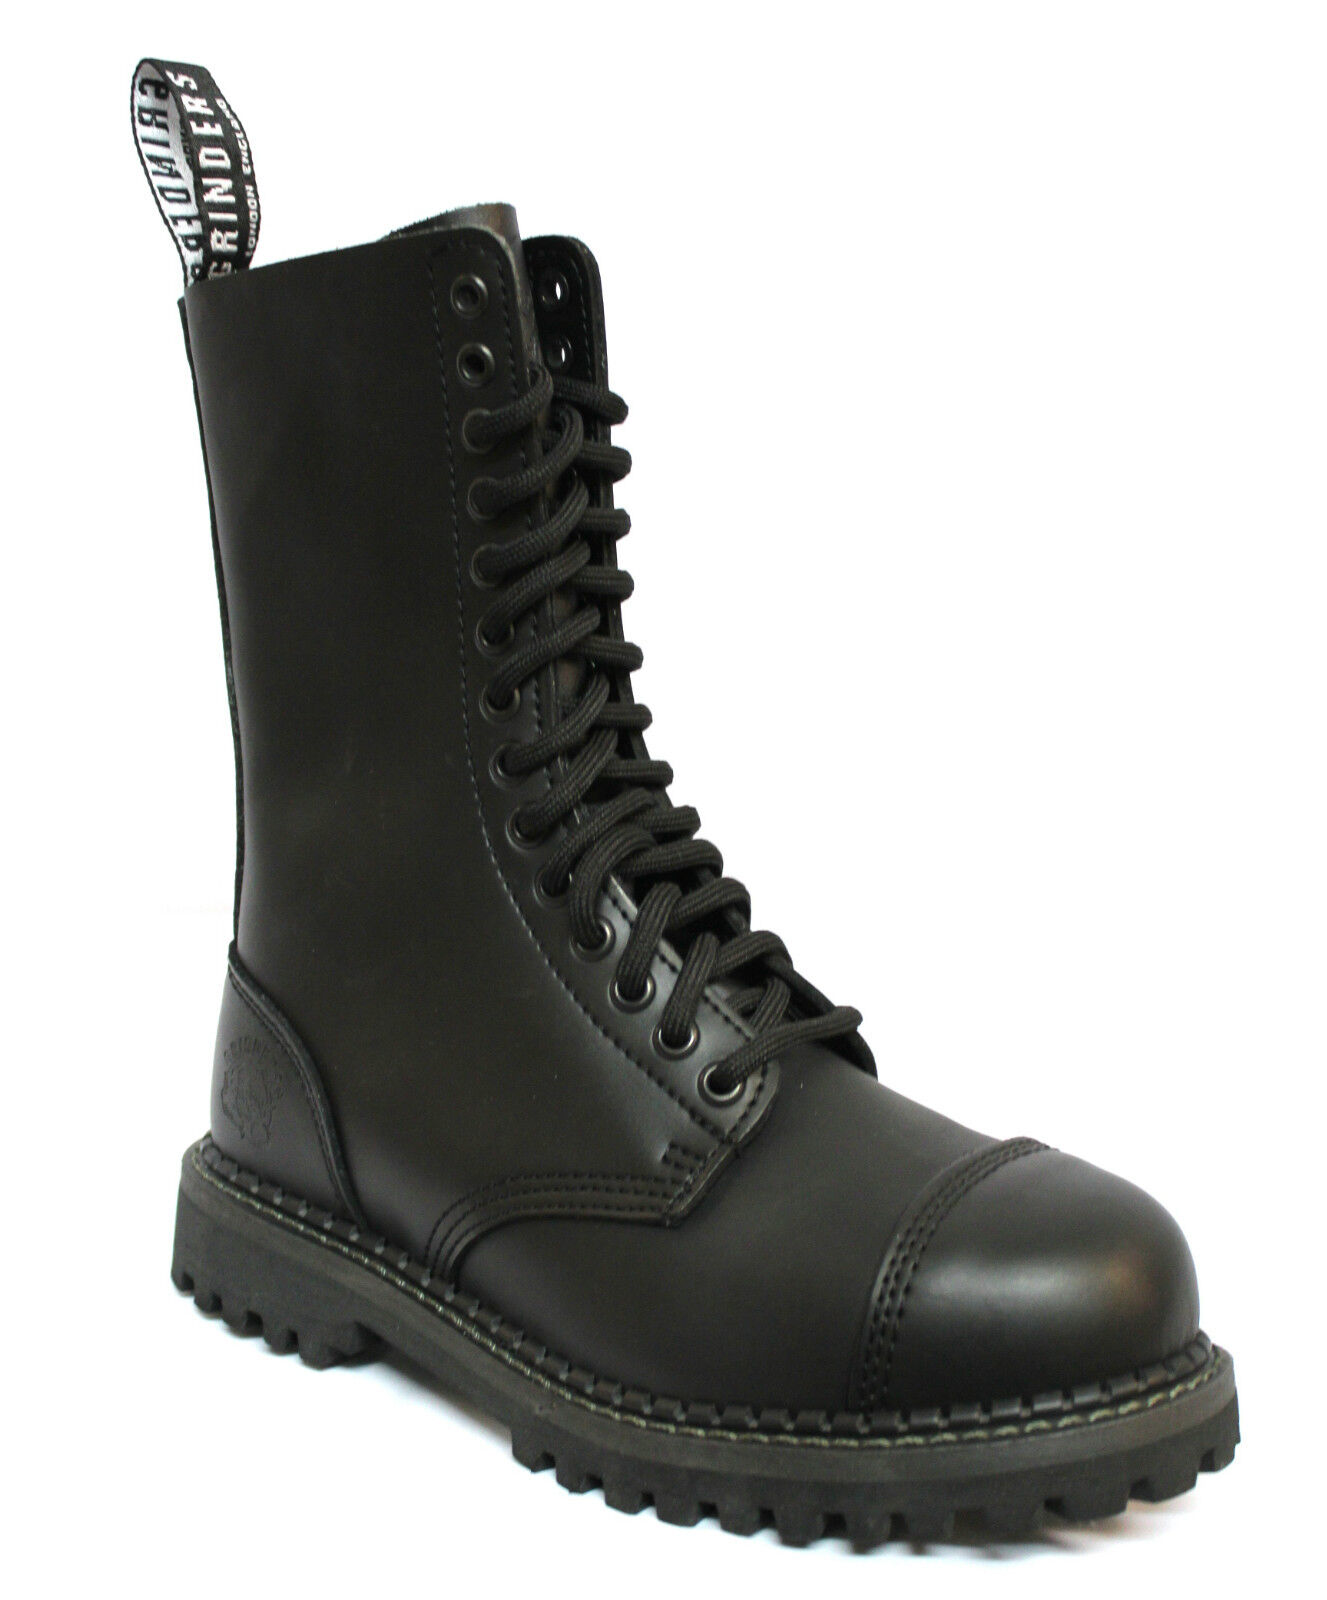 Grinders Männer formale schwarze 14 Eye Leder Militäruniform Stiefel